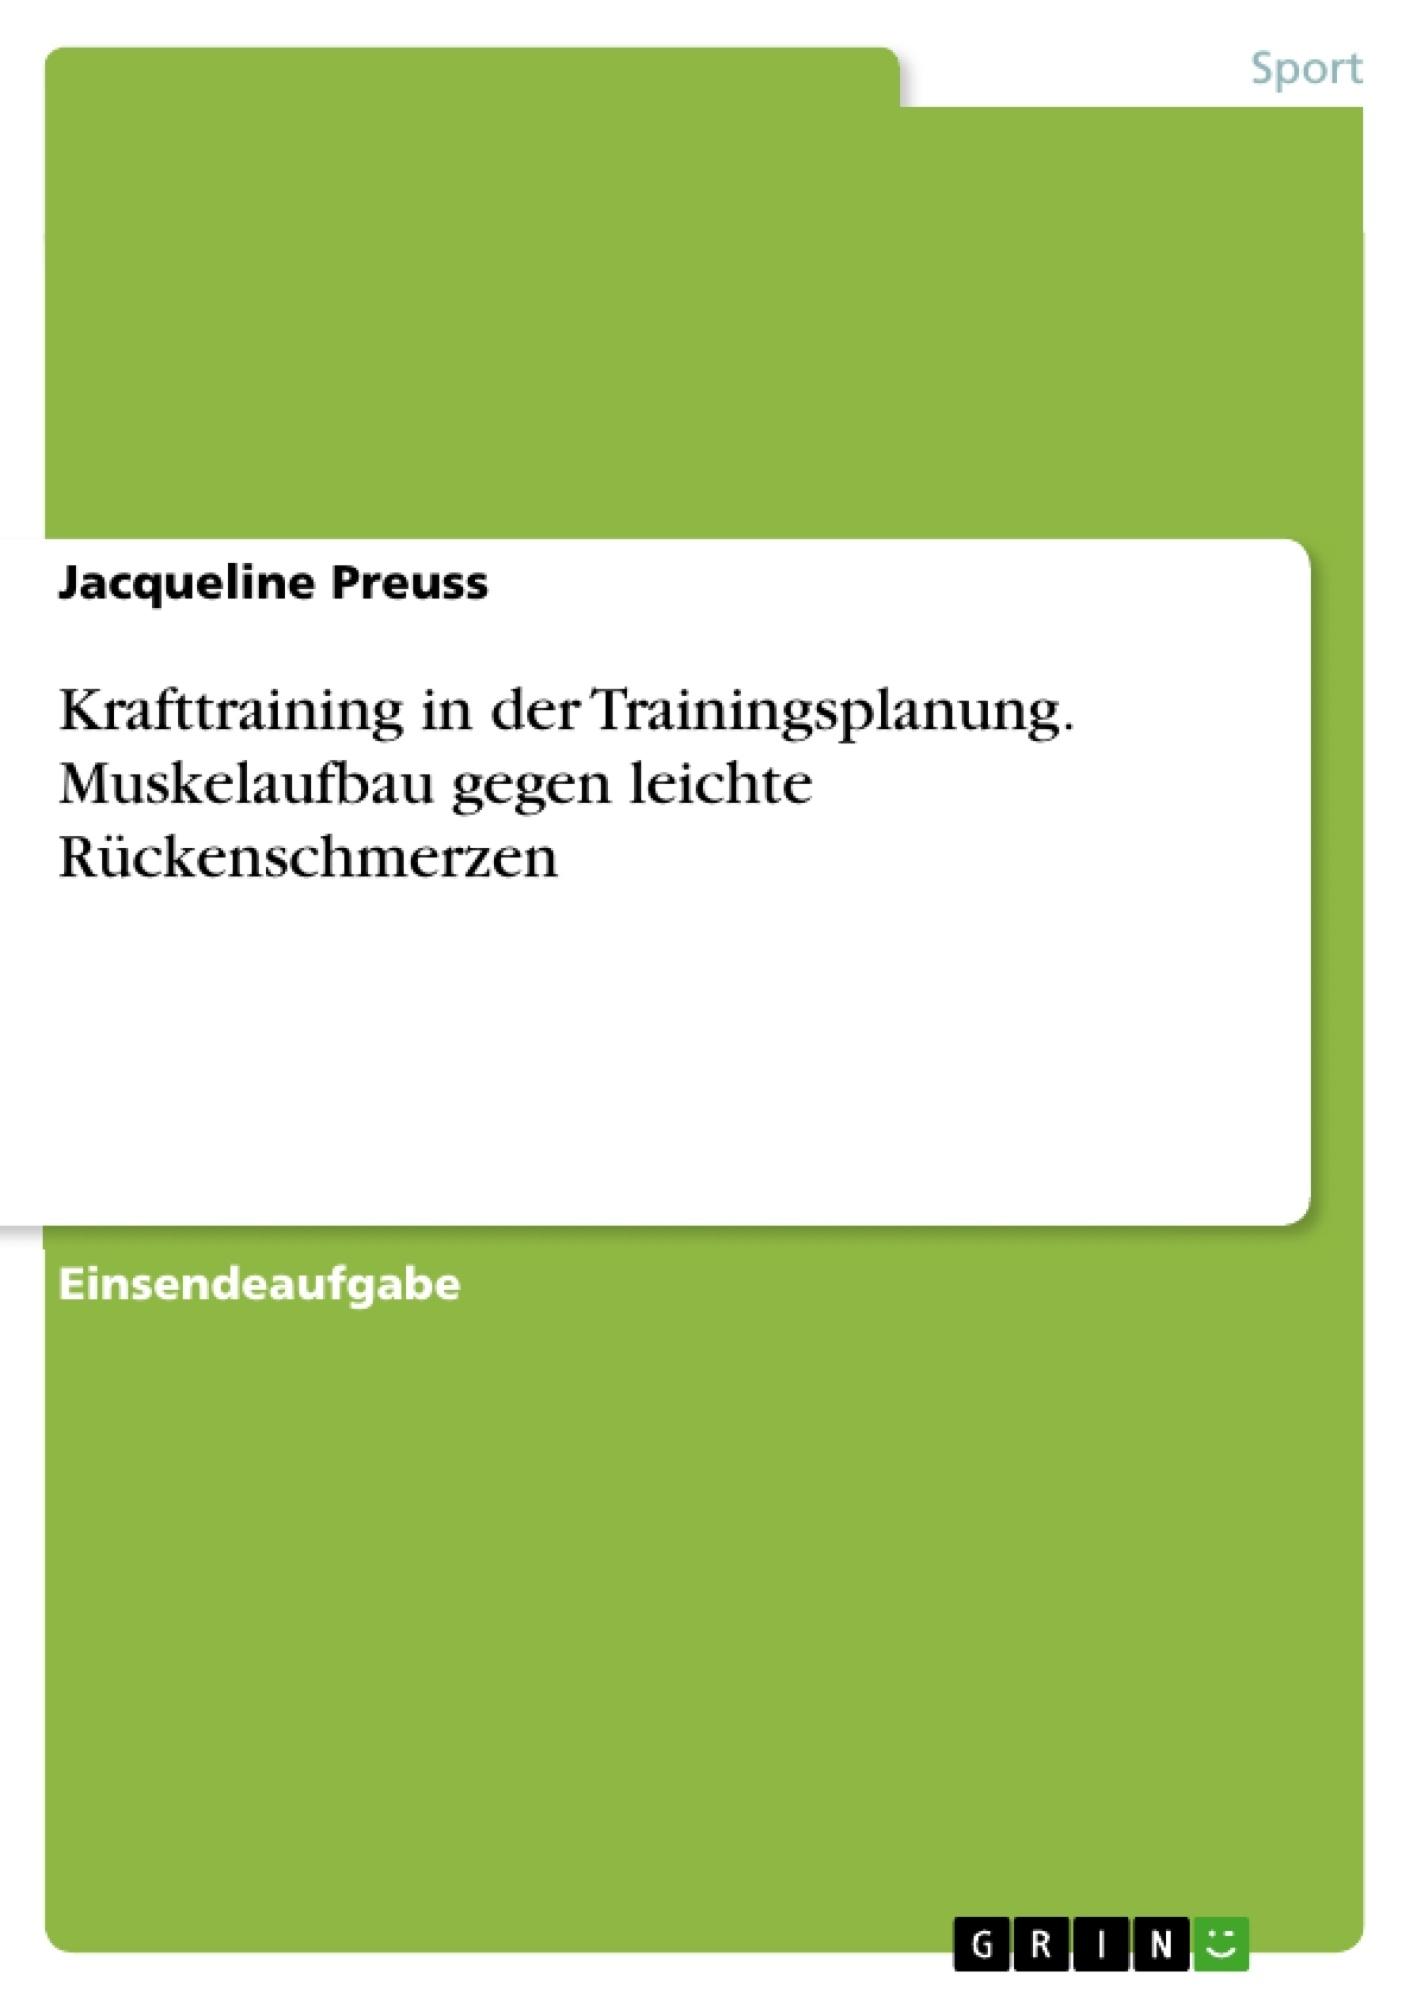 Titel: Krafttraining in der Trainingsplanung. Muskelaufbau gegen leichte Rückenschmerzen